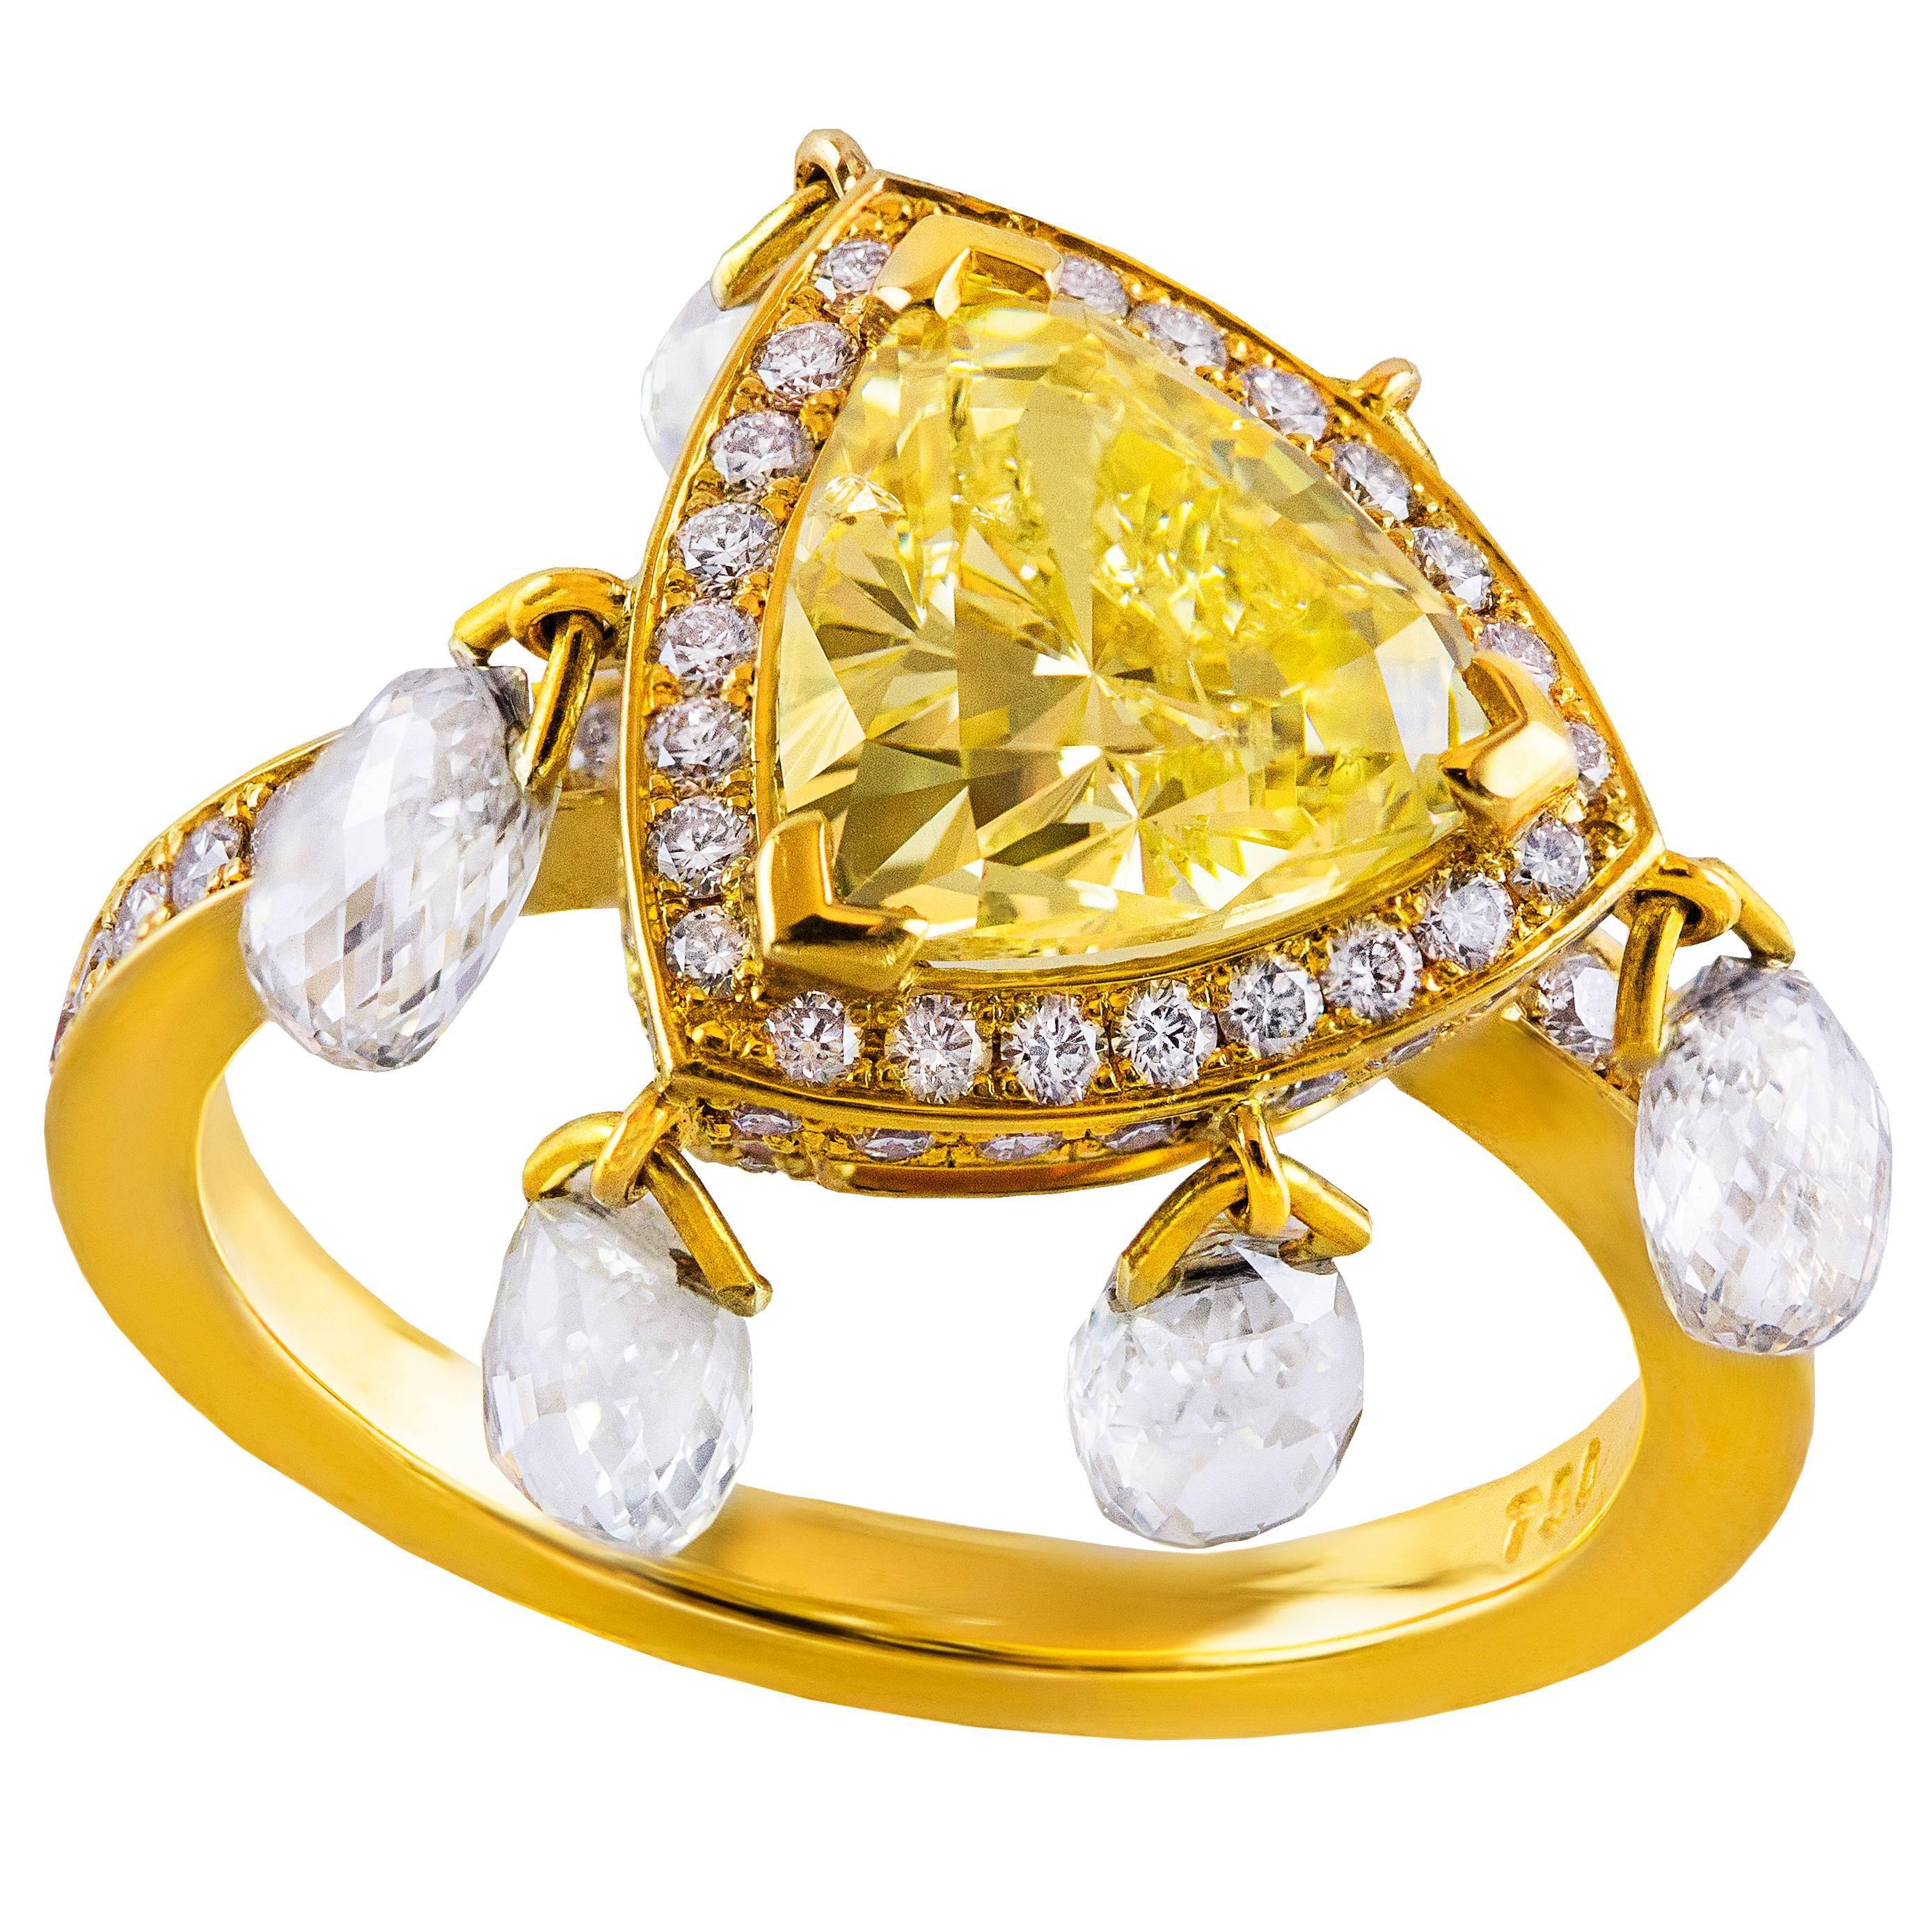 Roman Malakov GIA Certified 2 Carat Triangular Fancy Yellow Diamond Gold Ring